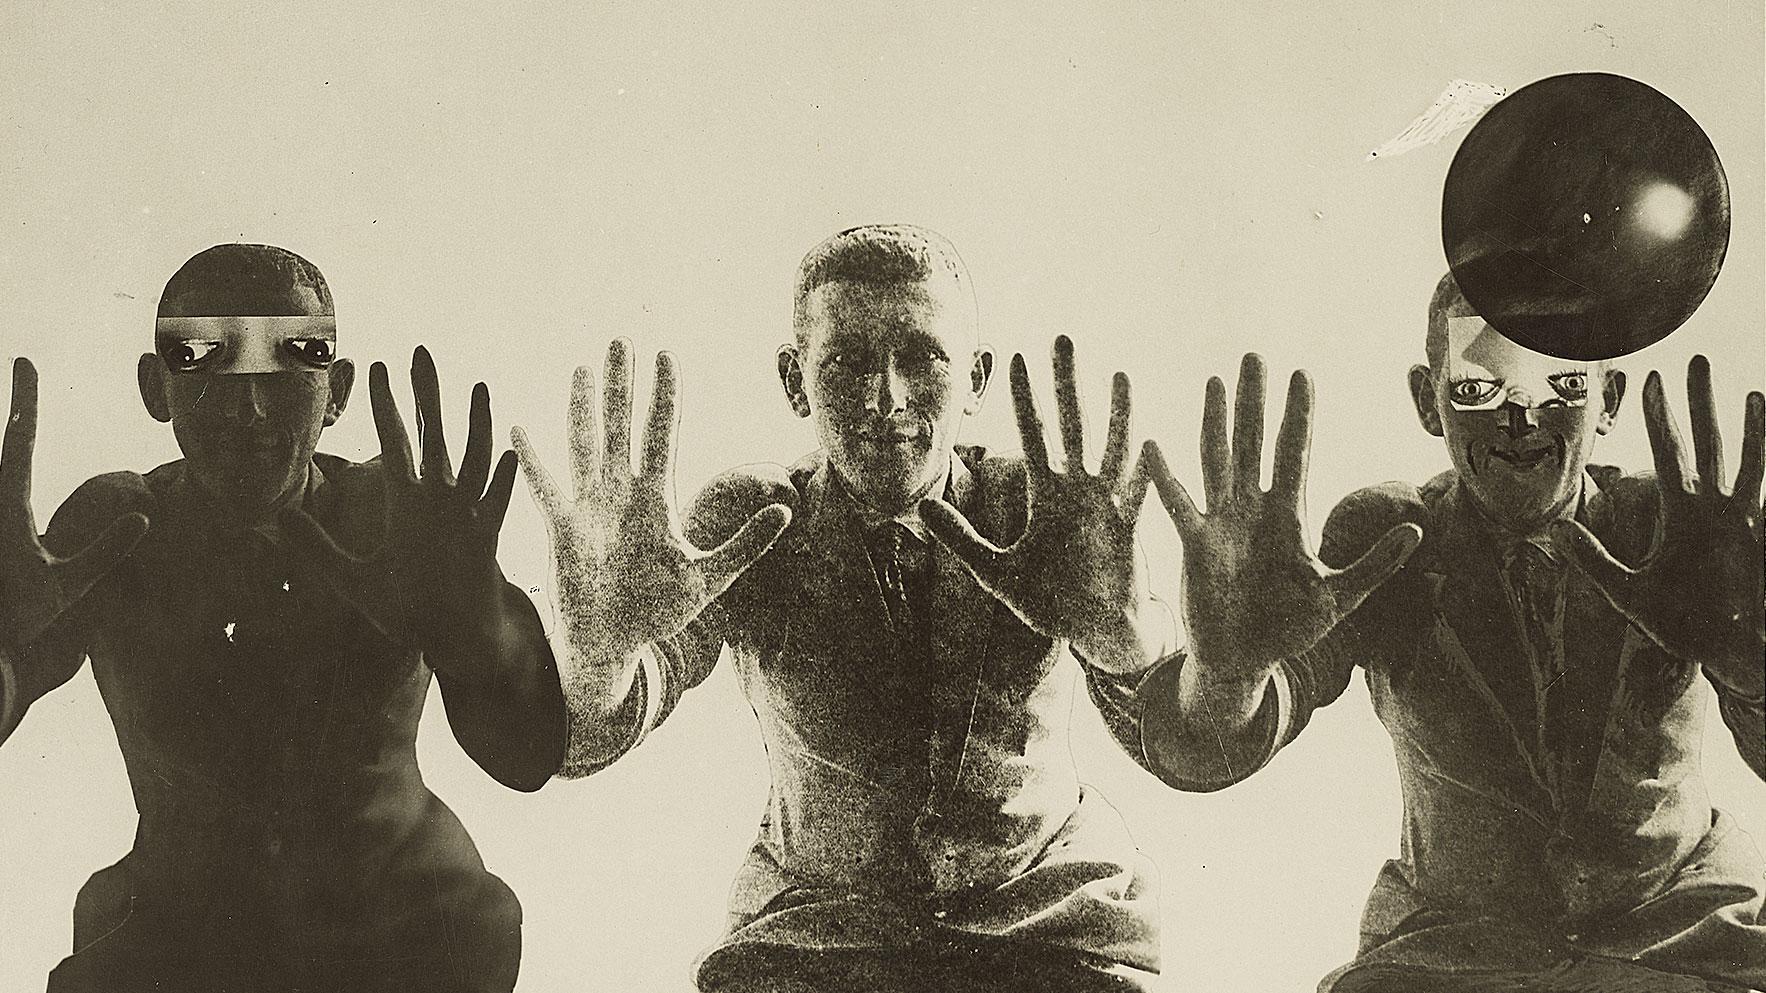 Art, Design, Play: Moholy-Nagy at the Guggenheim